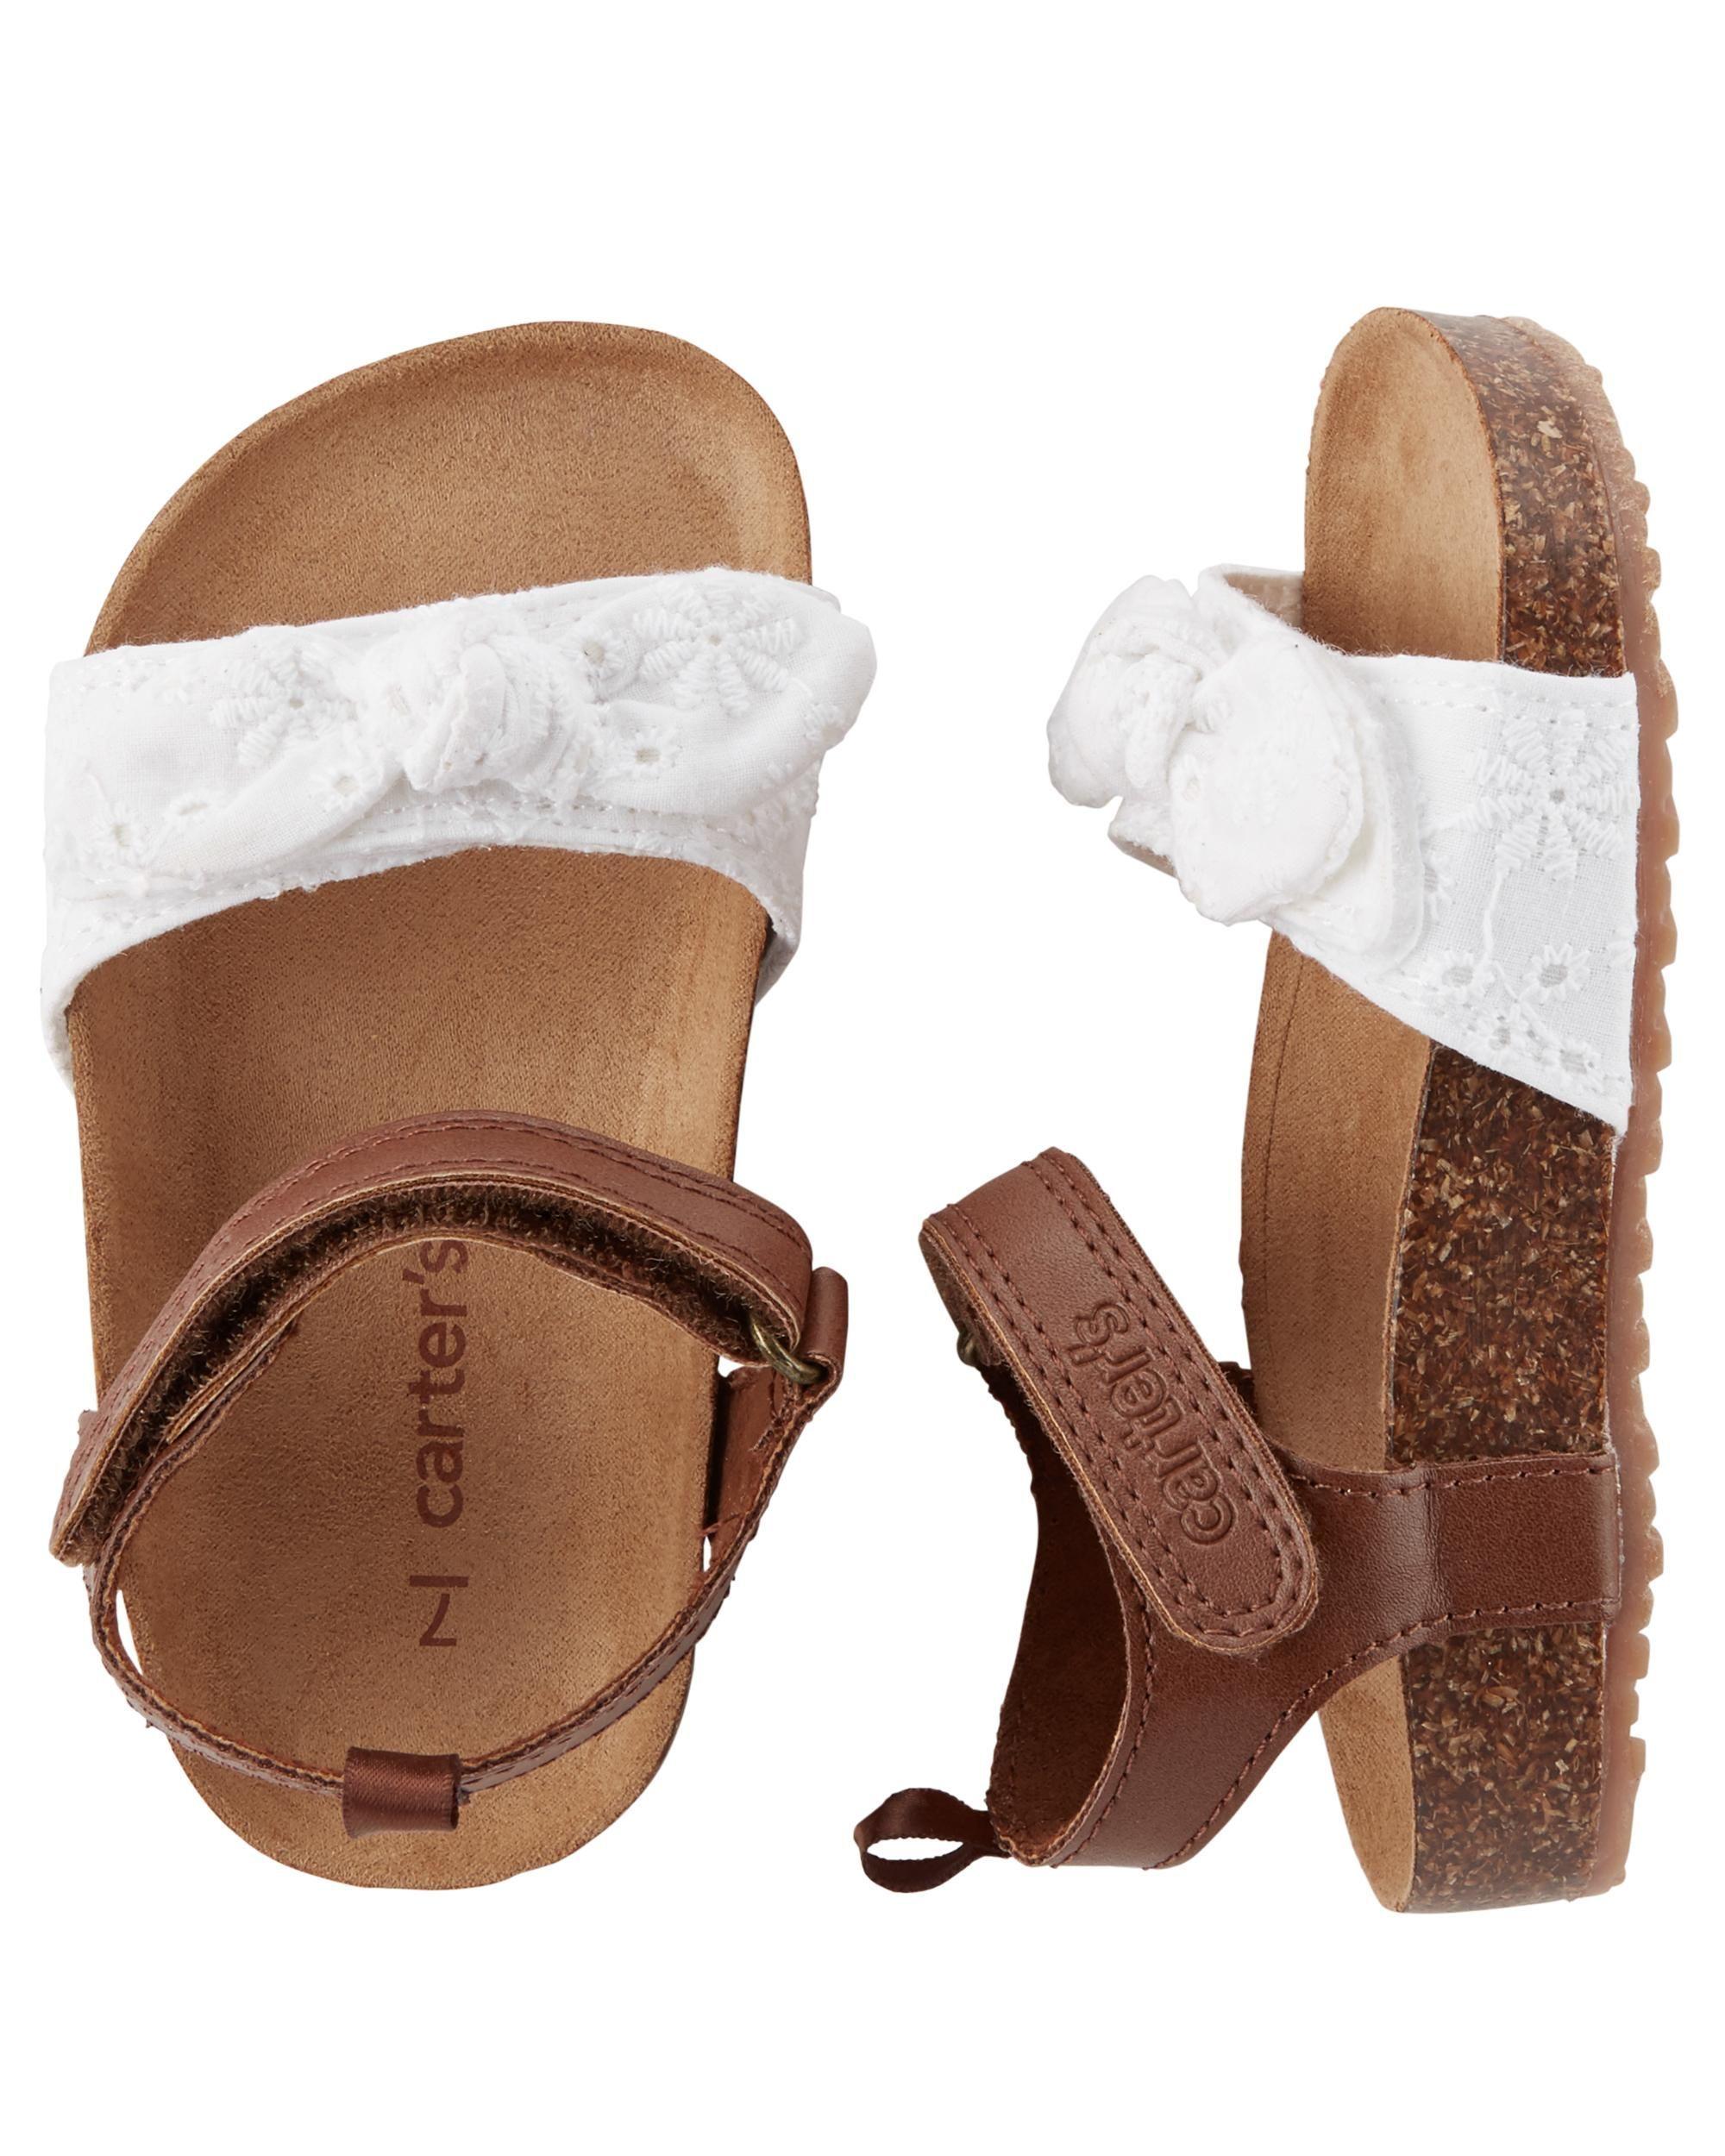 135b5430a Toddler Girl Carter s Eyelet Cork Sole Sandals